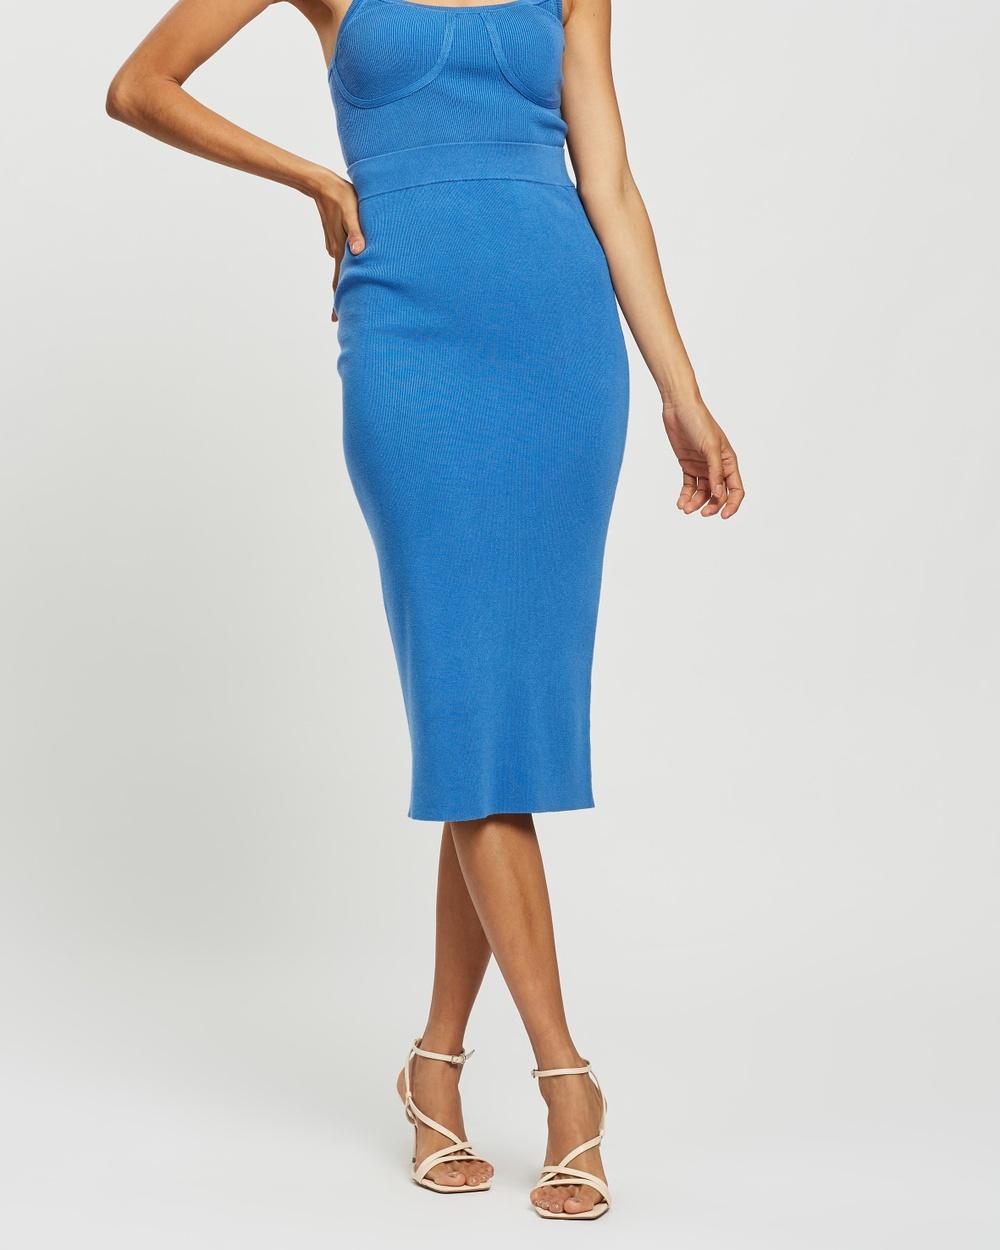 AERE Tubular Midi Skirt Skirts Azure